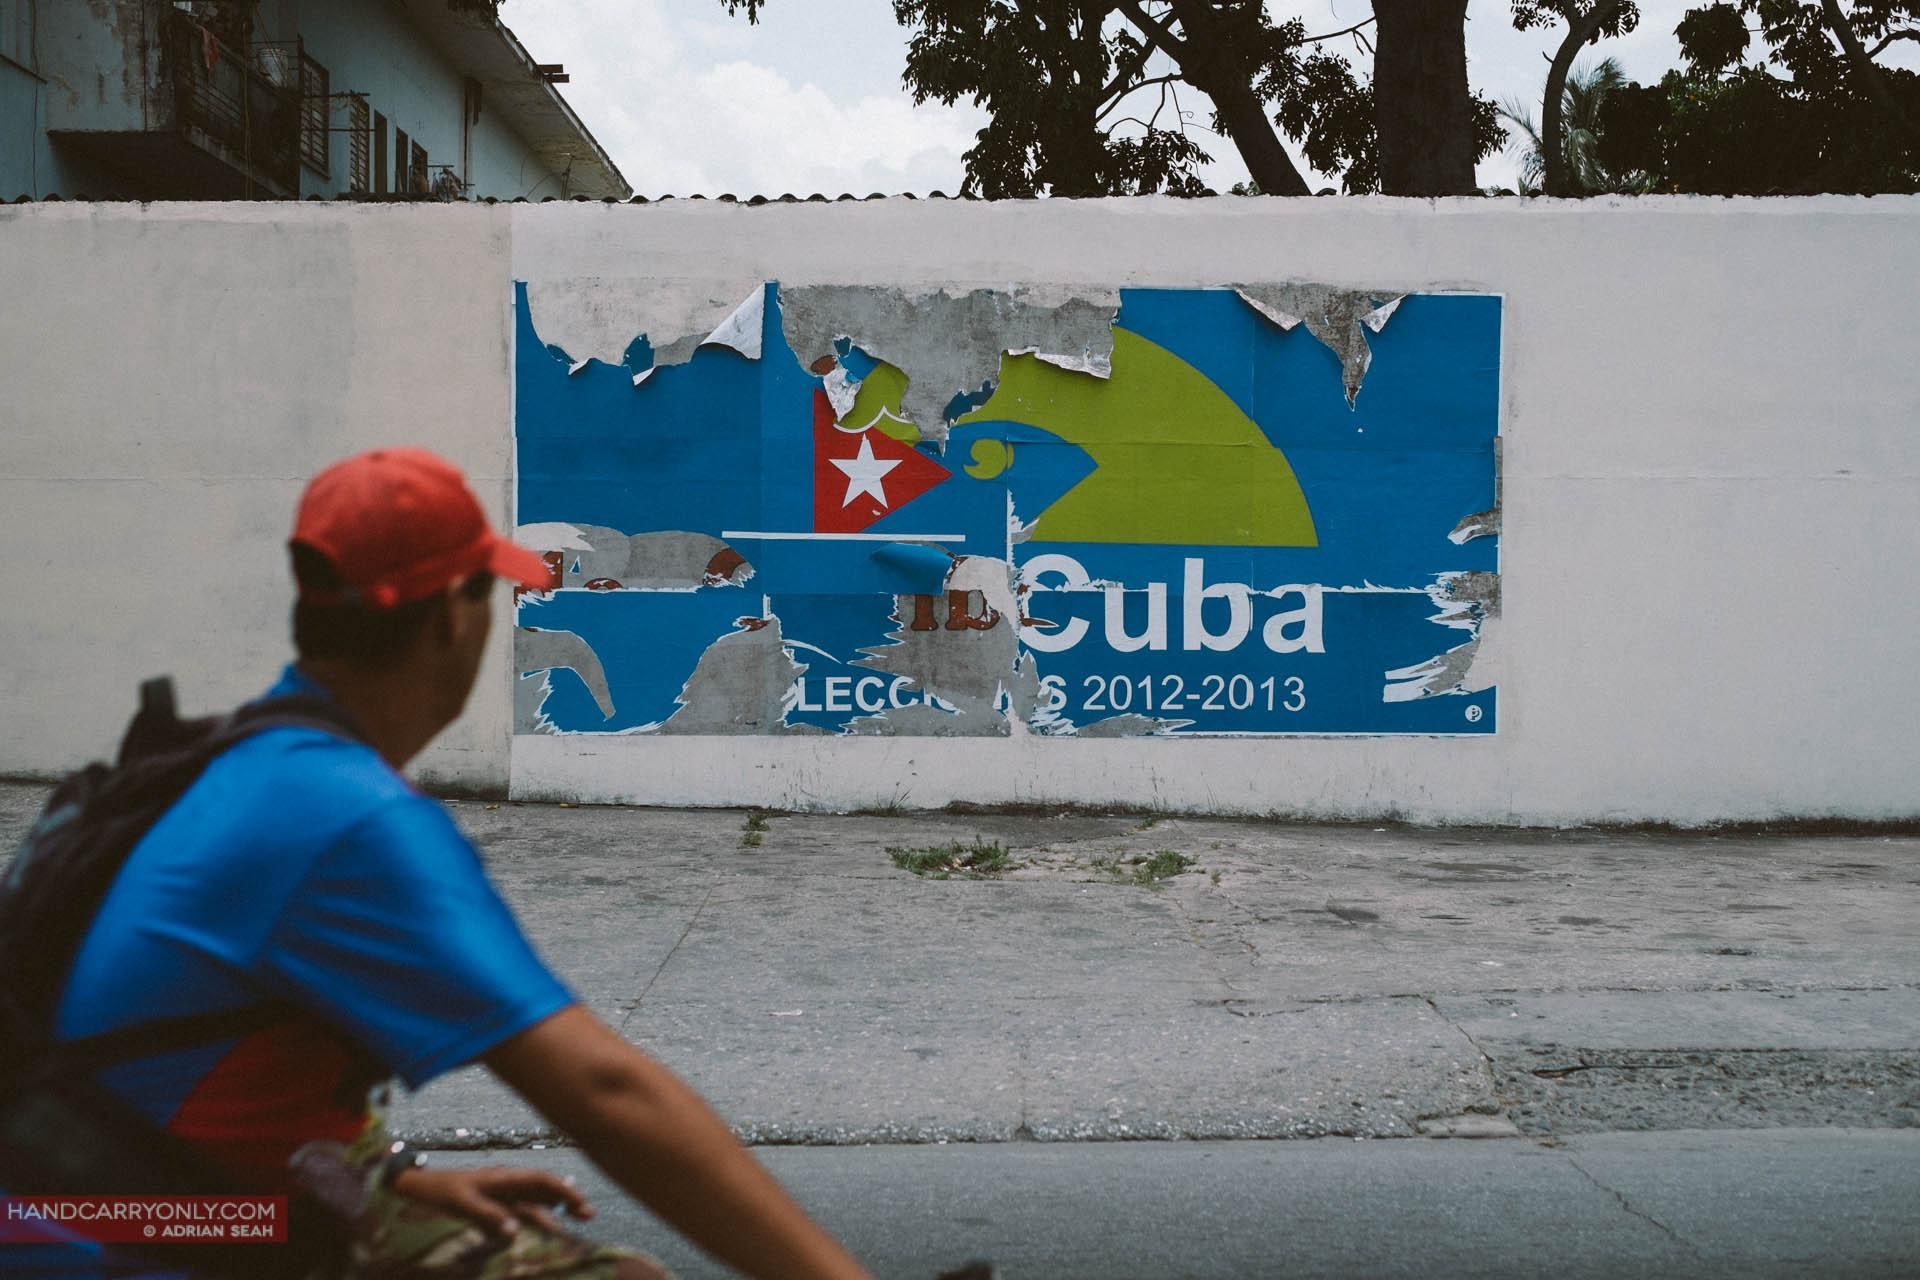 man cycling past crumbling cuban sign